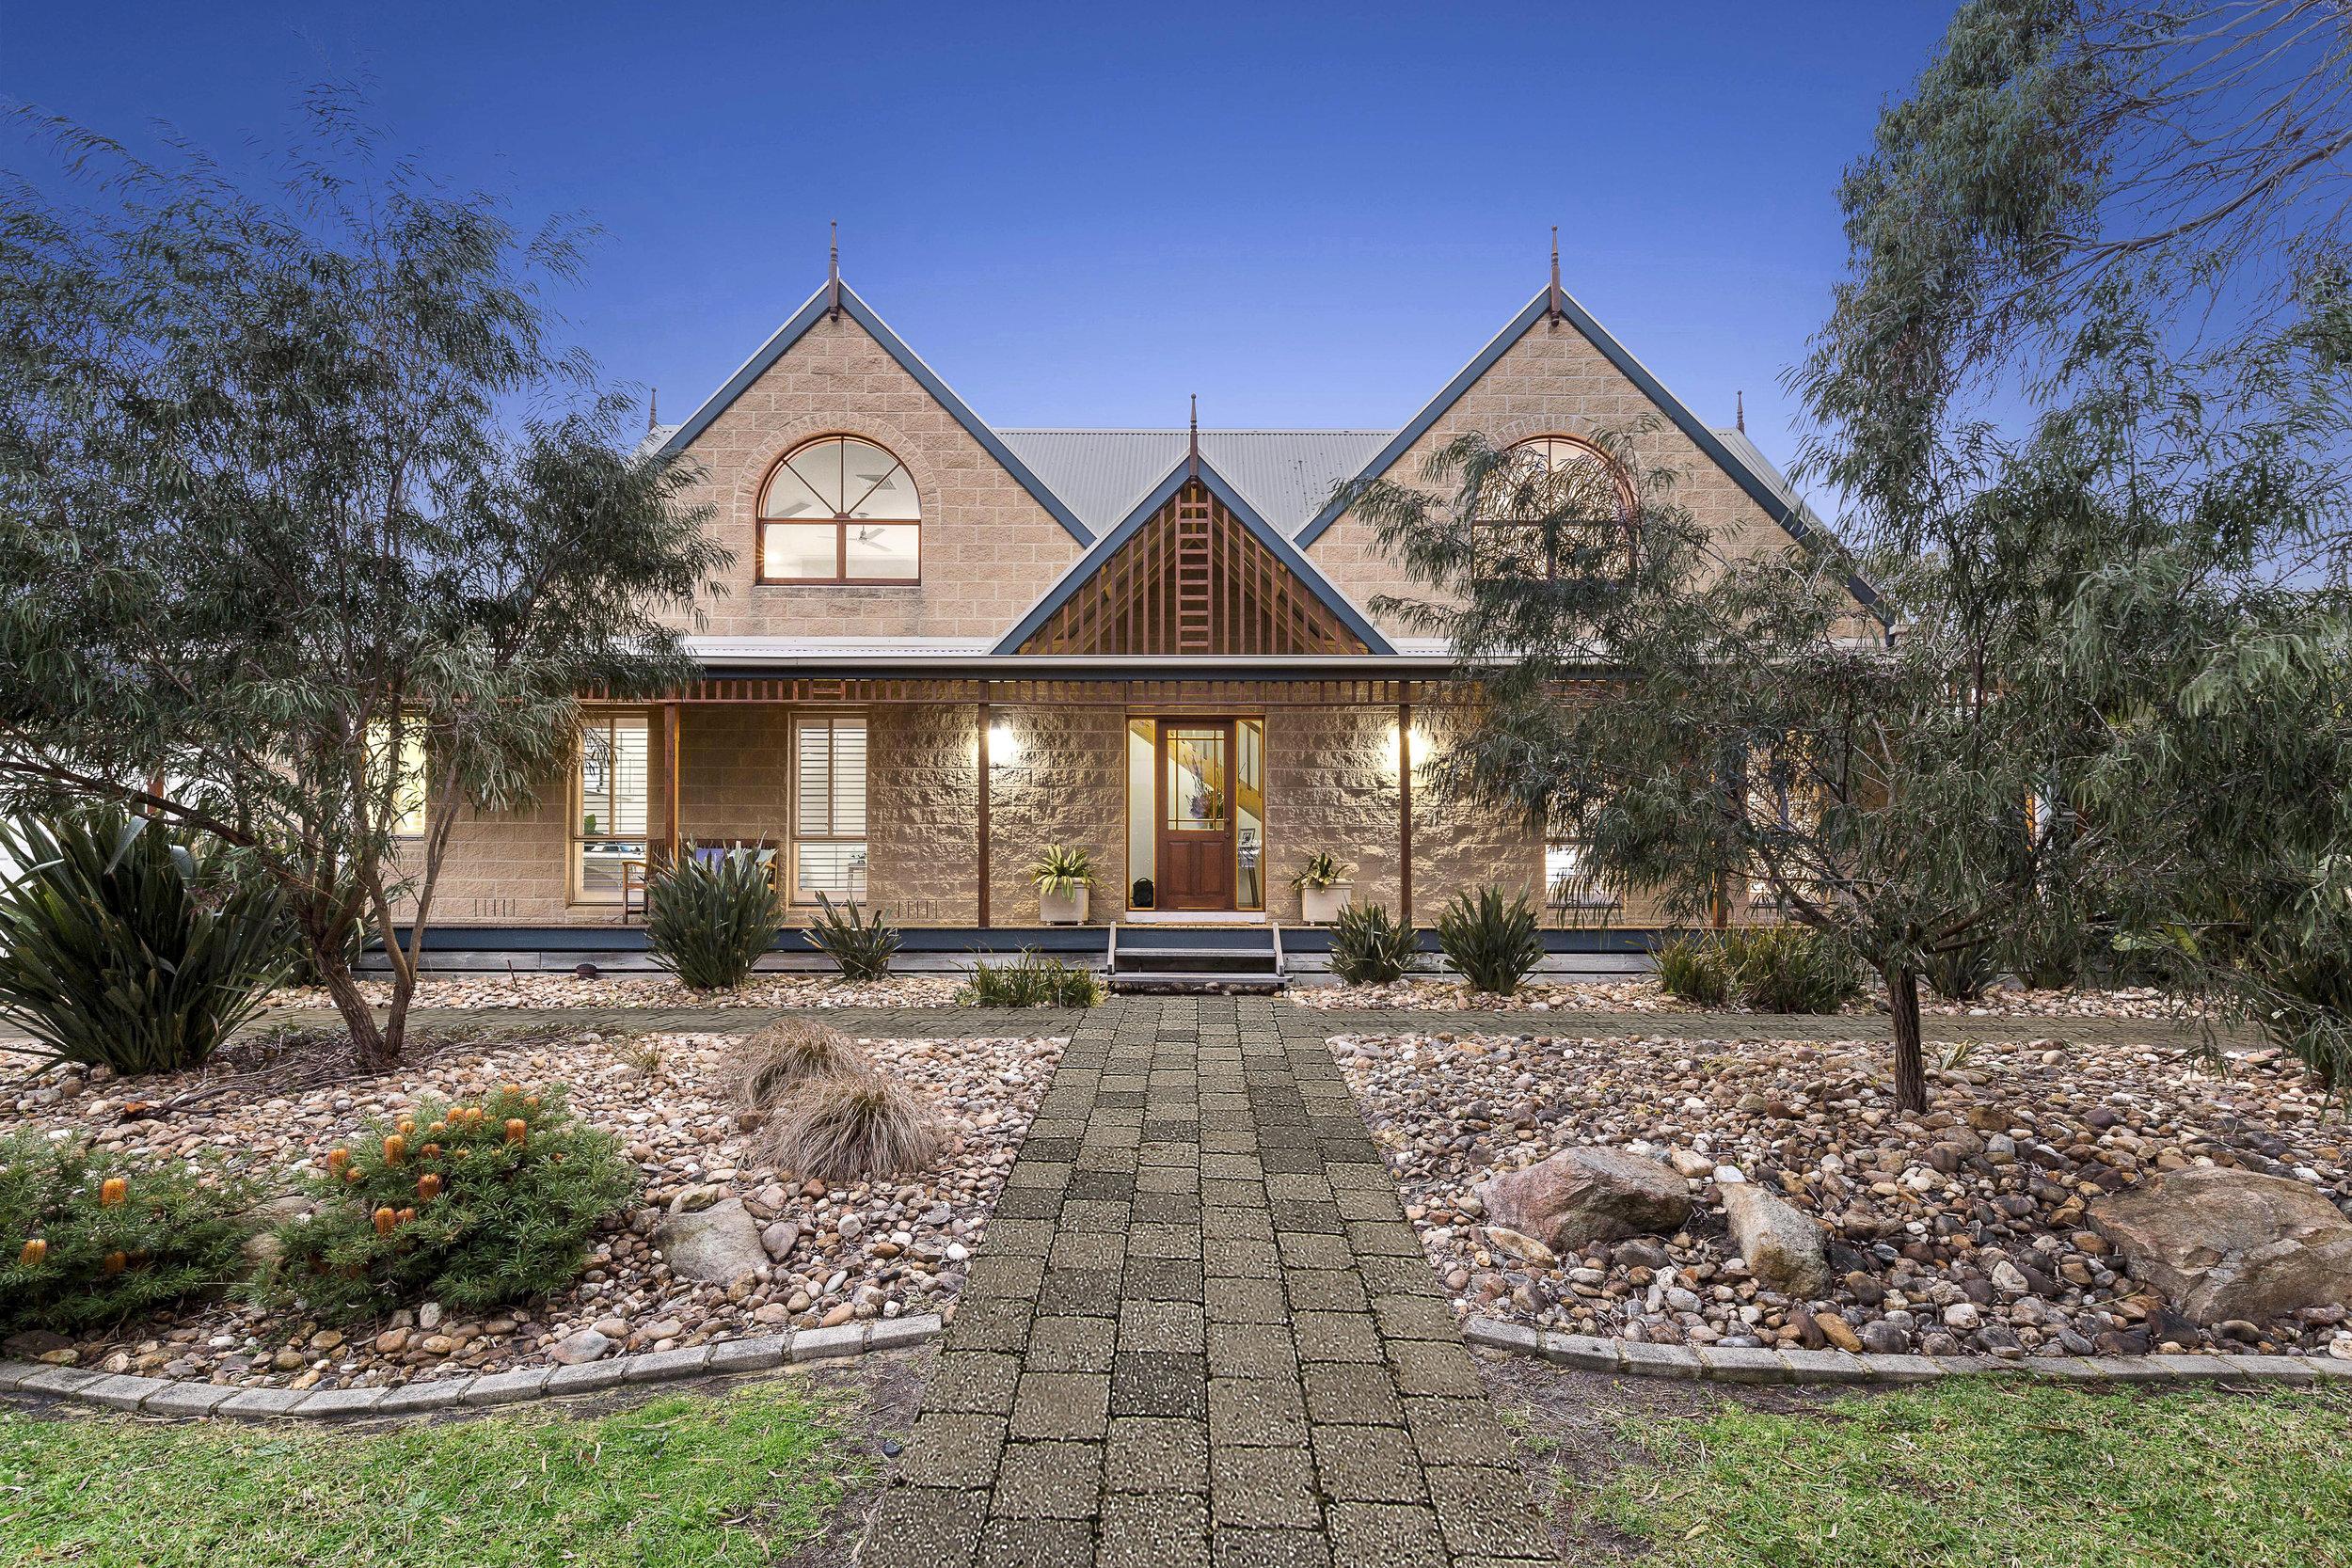 4 Jasper Court, Mount Martha SOLD 2017 Quote $1,600,000-$1,750,000  Sale Price Undisclosed